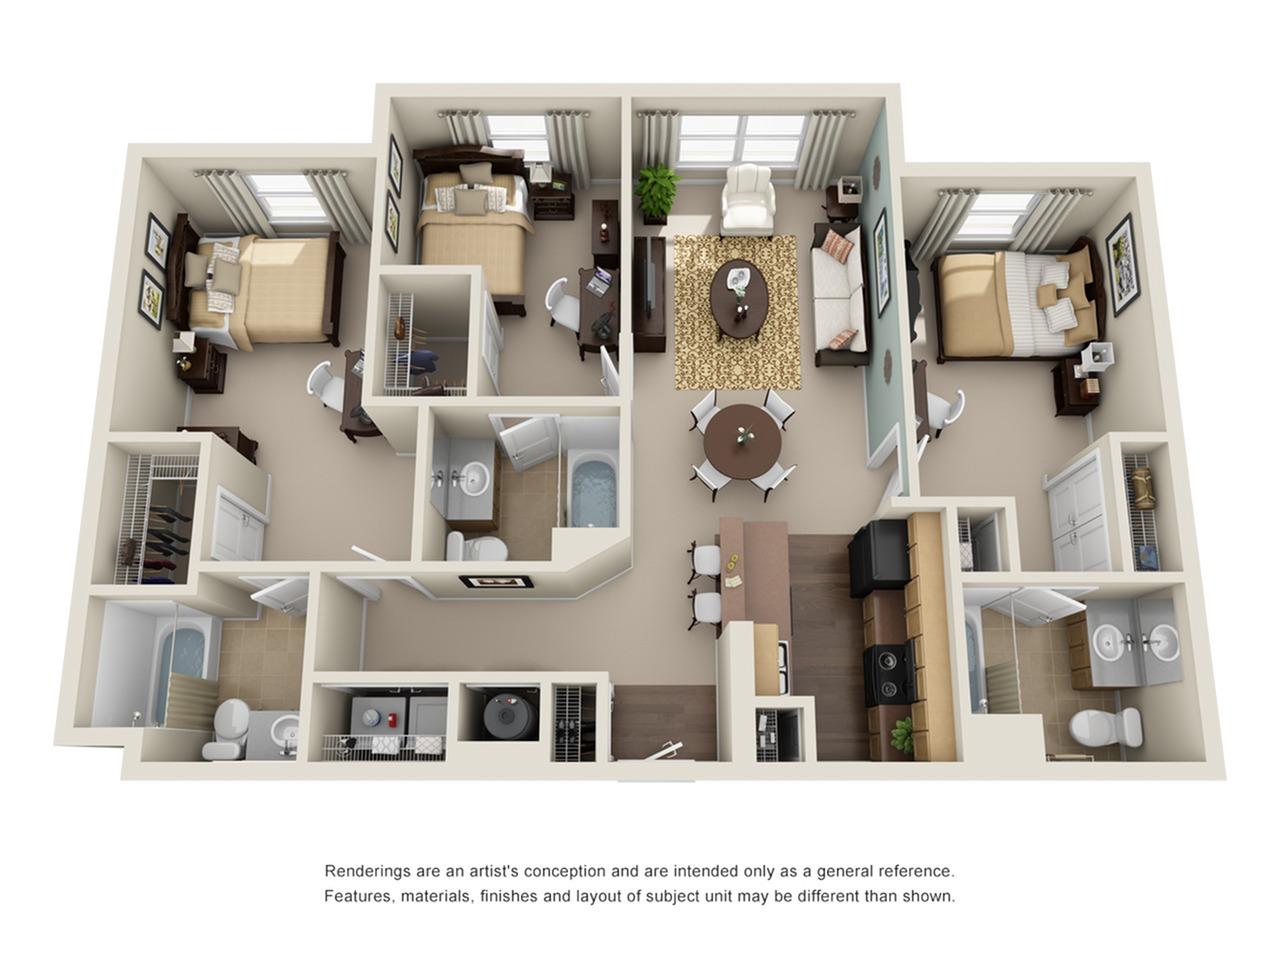 3 bedroom apartment in atlanta